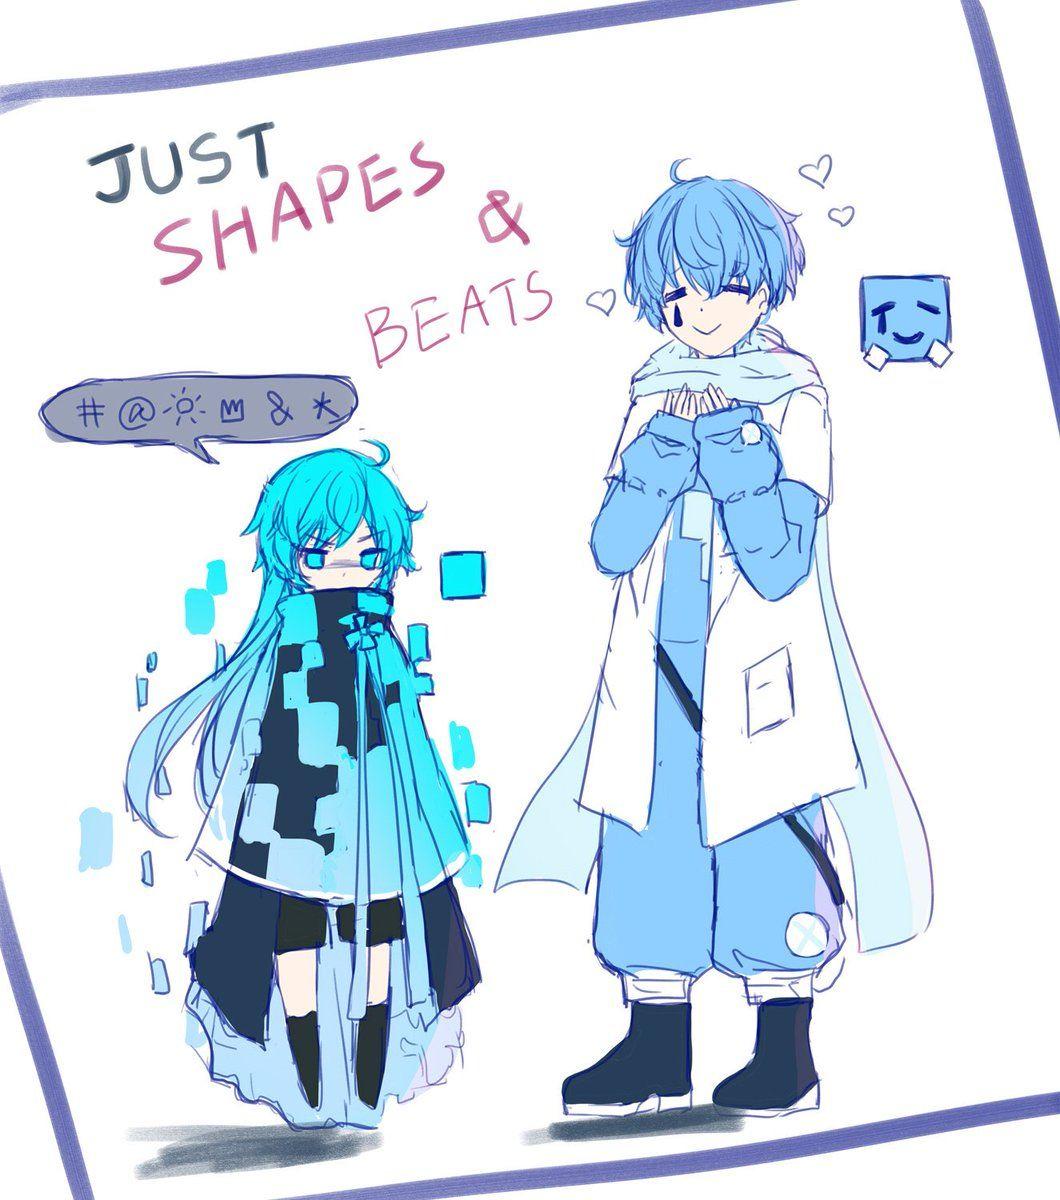 Resultado De Imagen Para Just Shapes And Beats Fanart Fan Art Anime Shapes